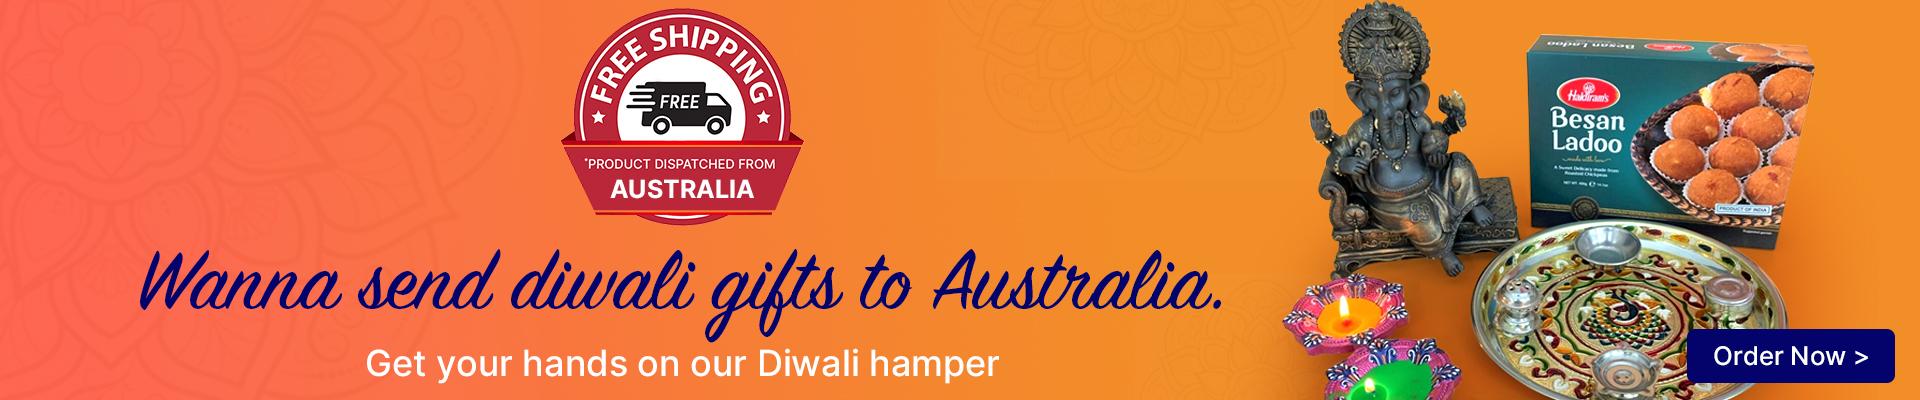 diwali-gift-to-australia.jpg